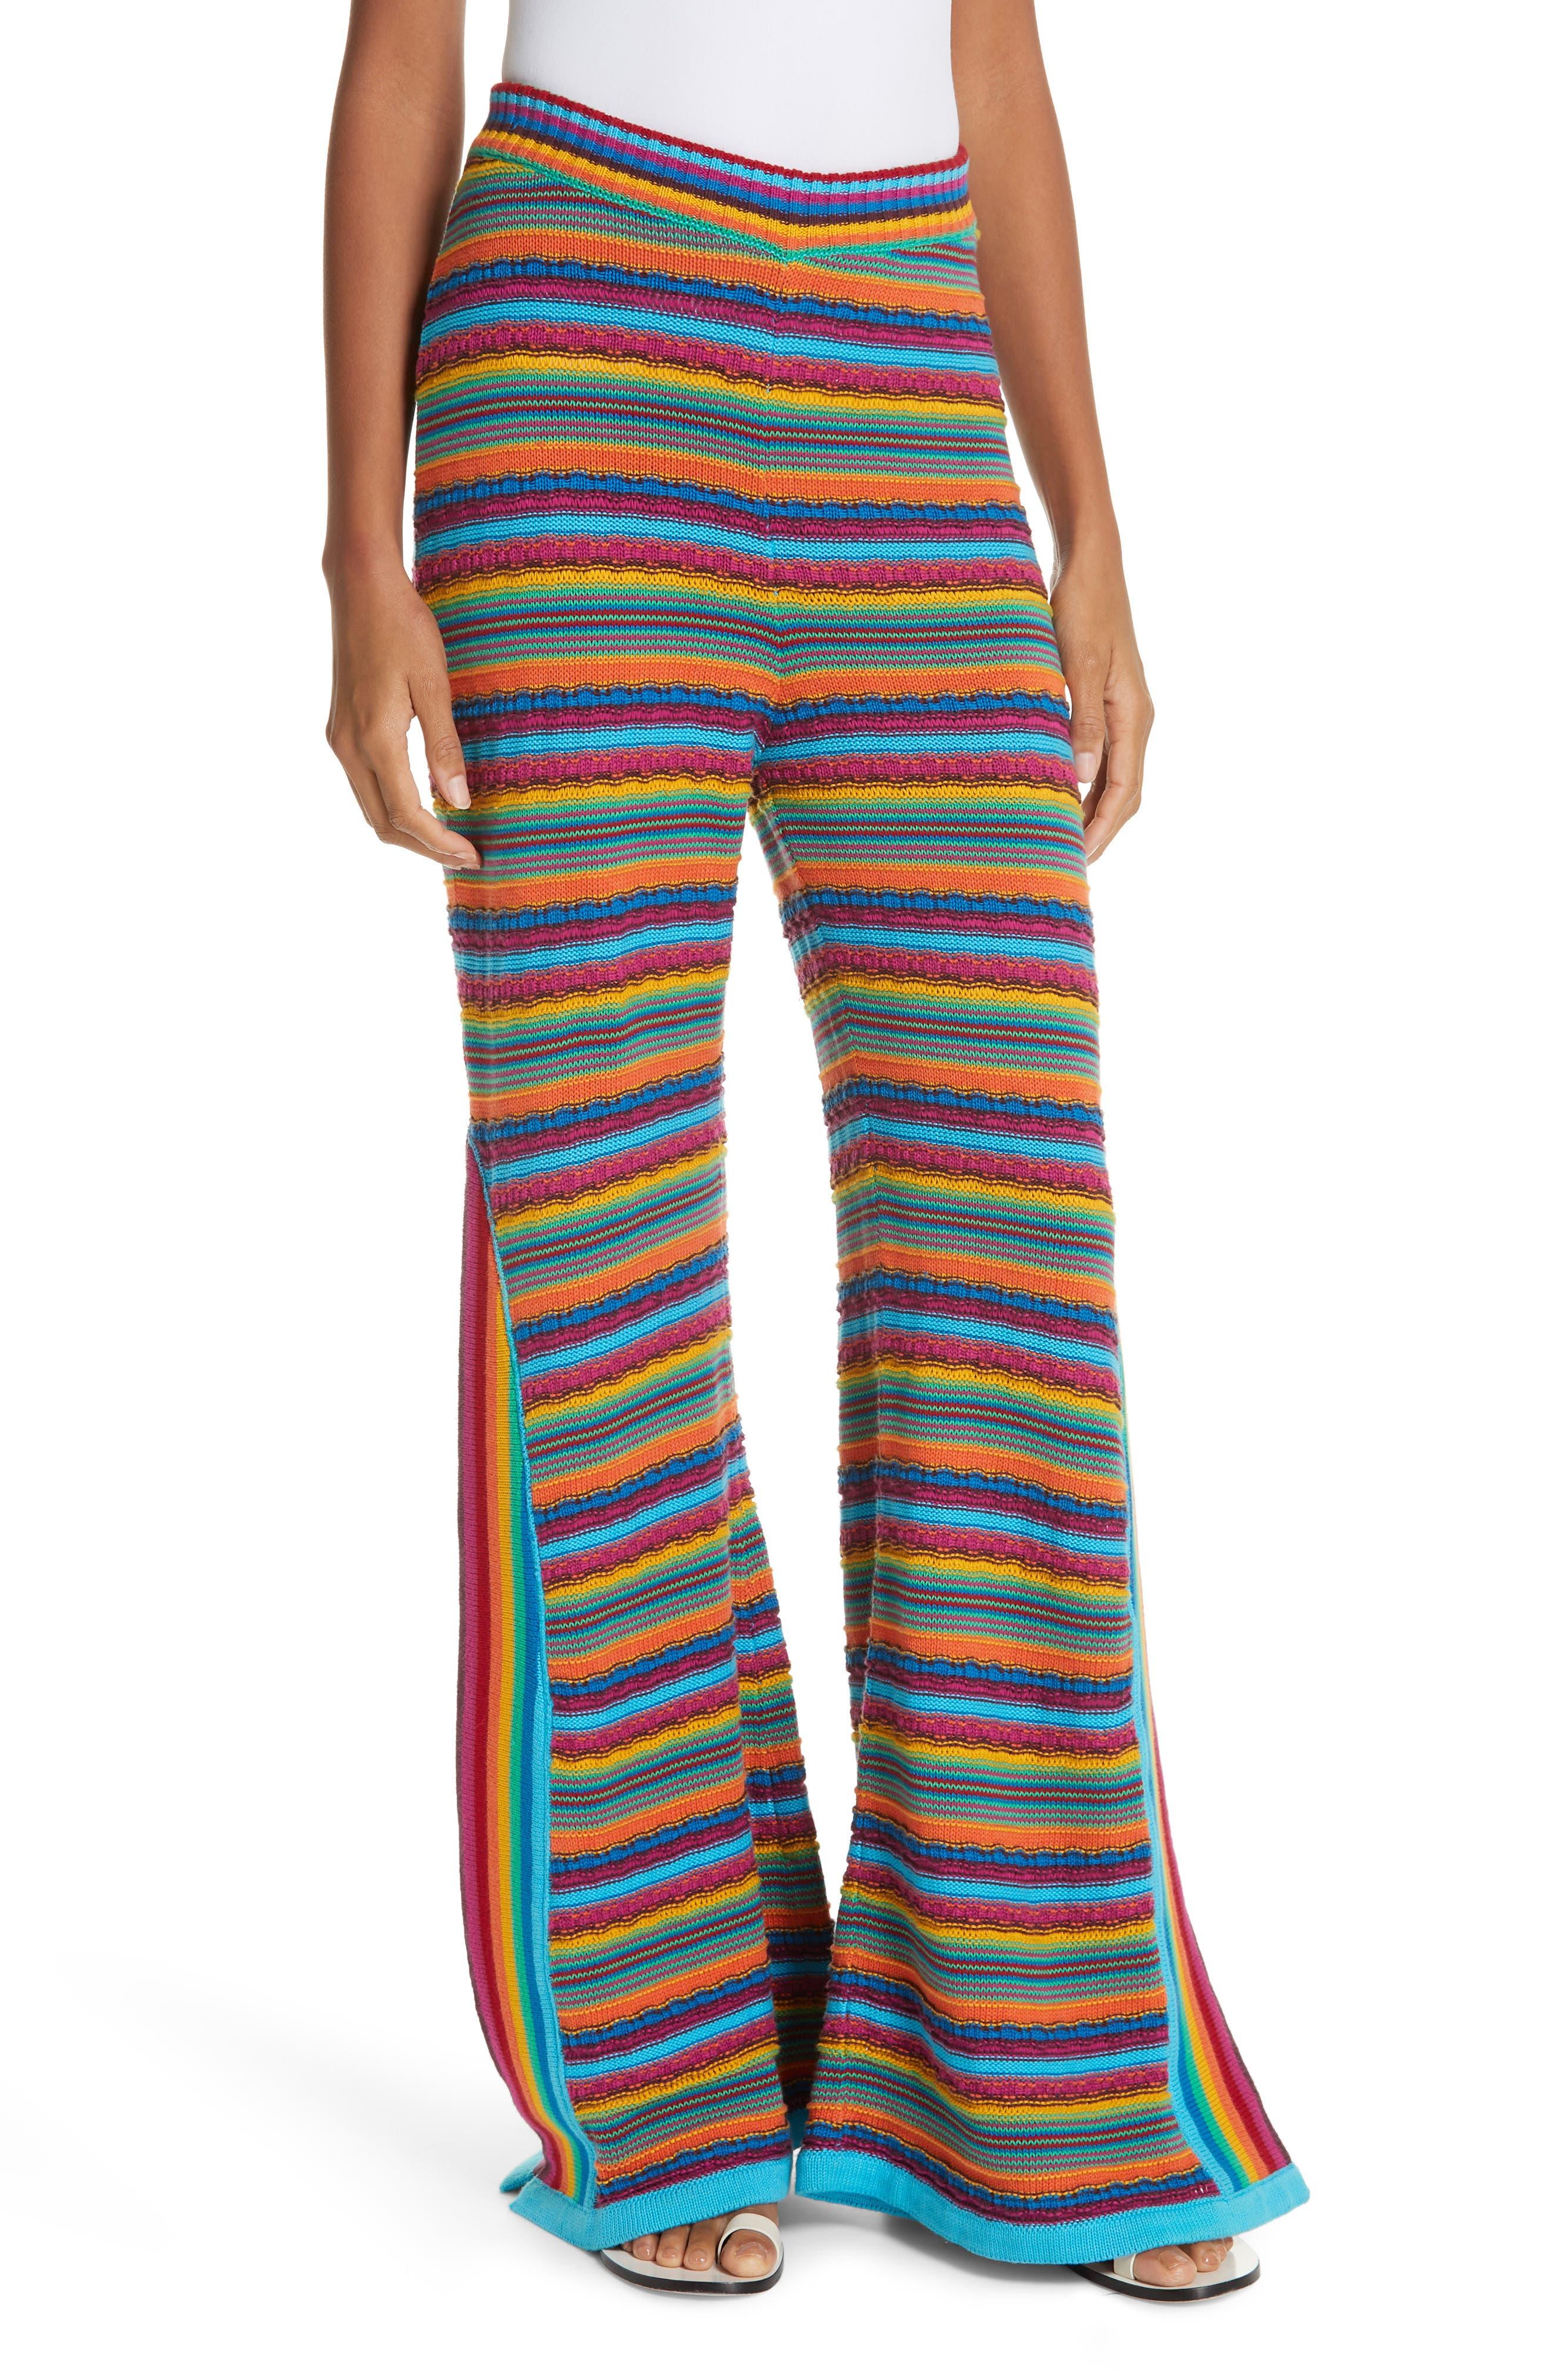 60s – 70s Pants, Jeans, Hippie, Bell Bottoms, Jumpsuits Womens All Things Mochi Oceana Stripe Crochet Pants $195.98 AT vintagedancer.com